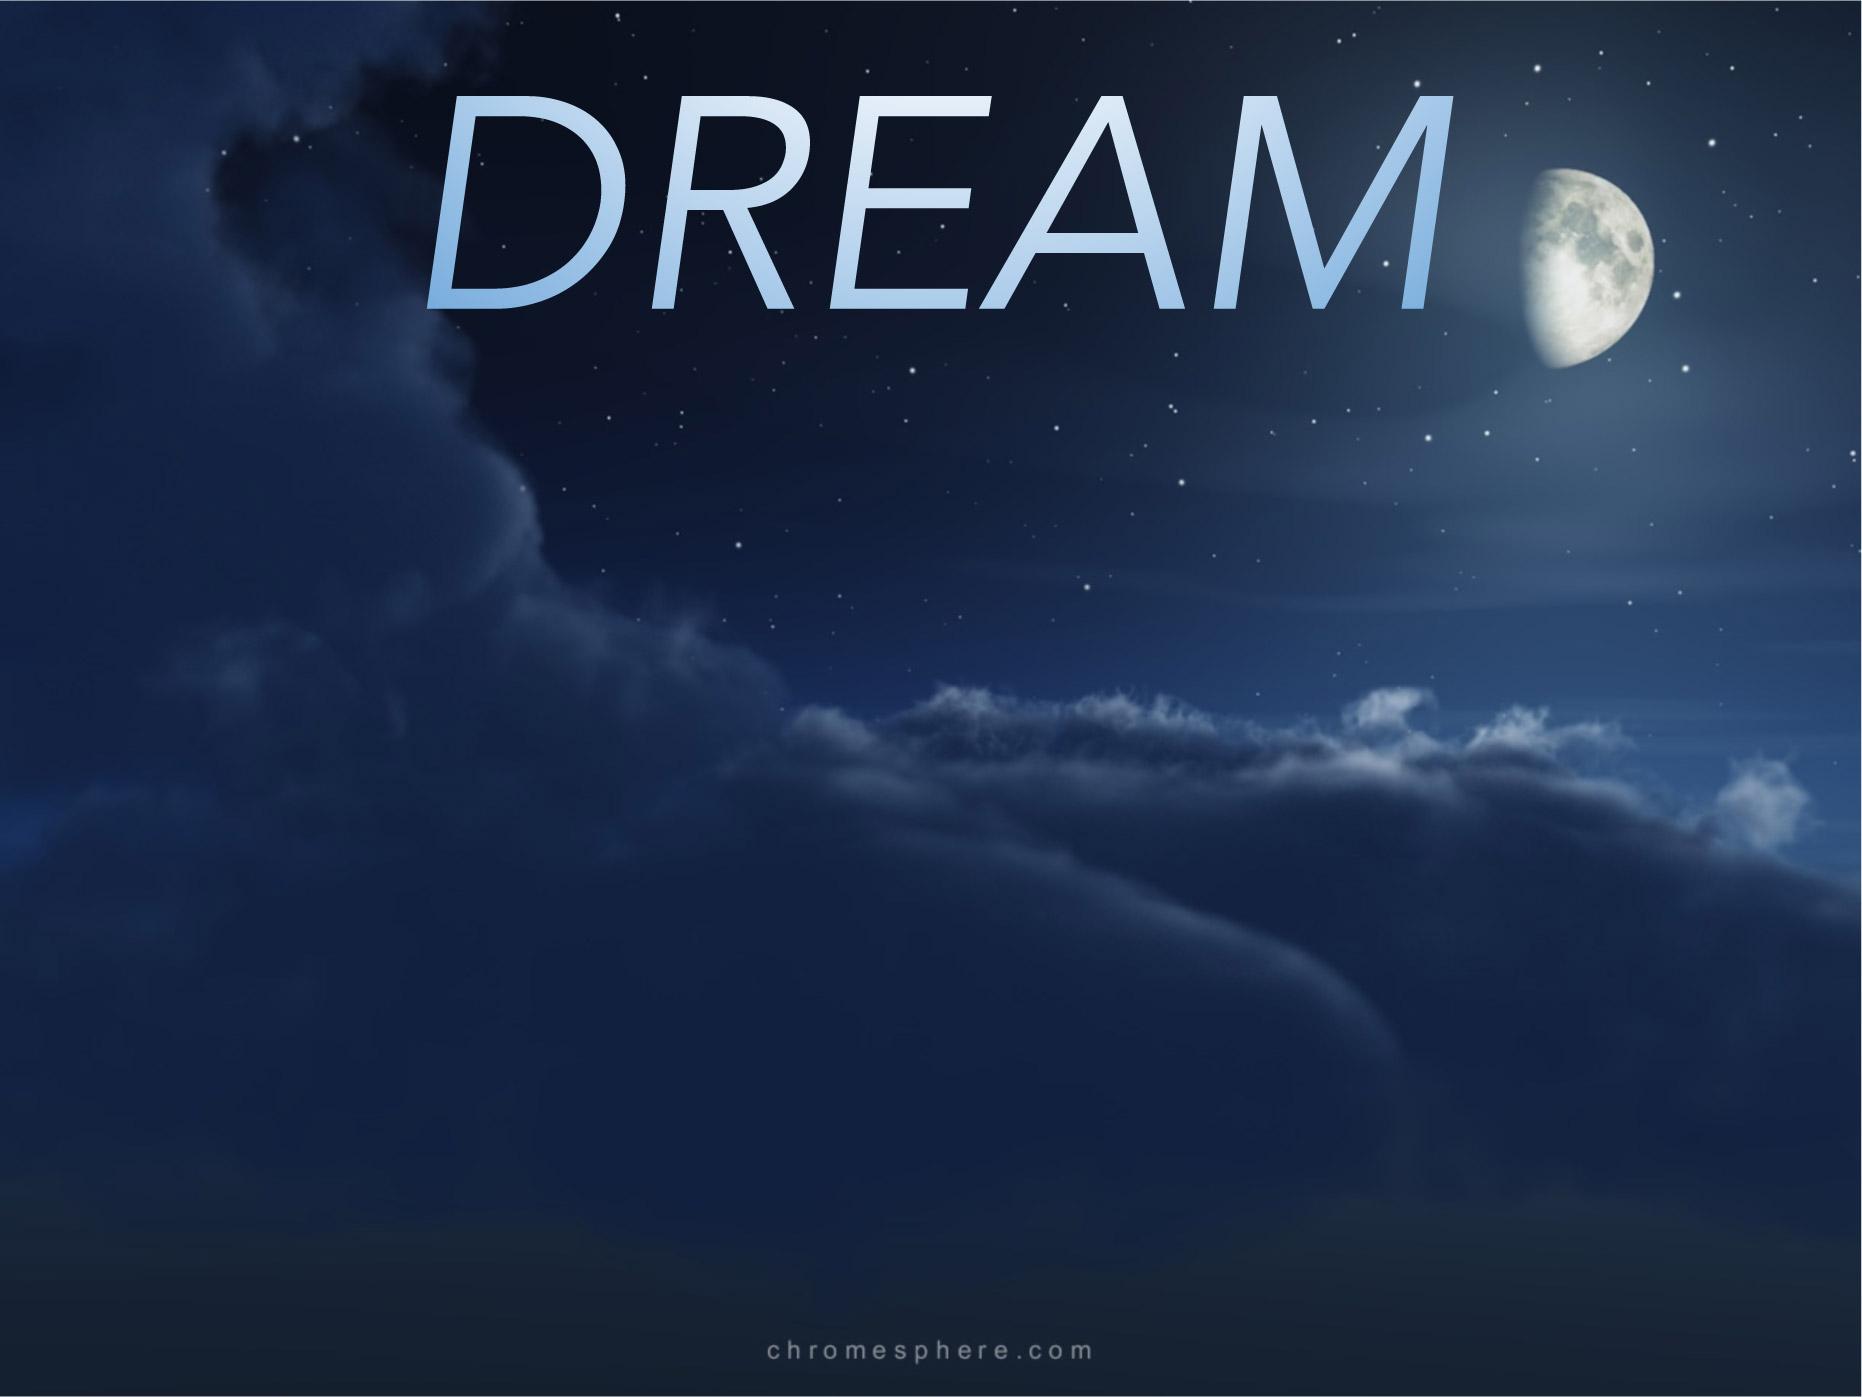 Dream - 4th Sunday of Advent